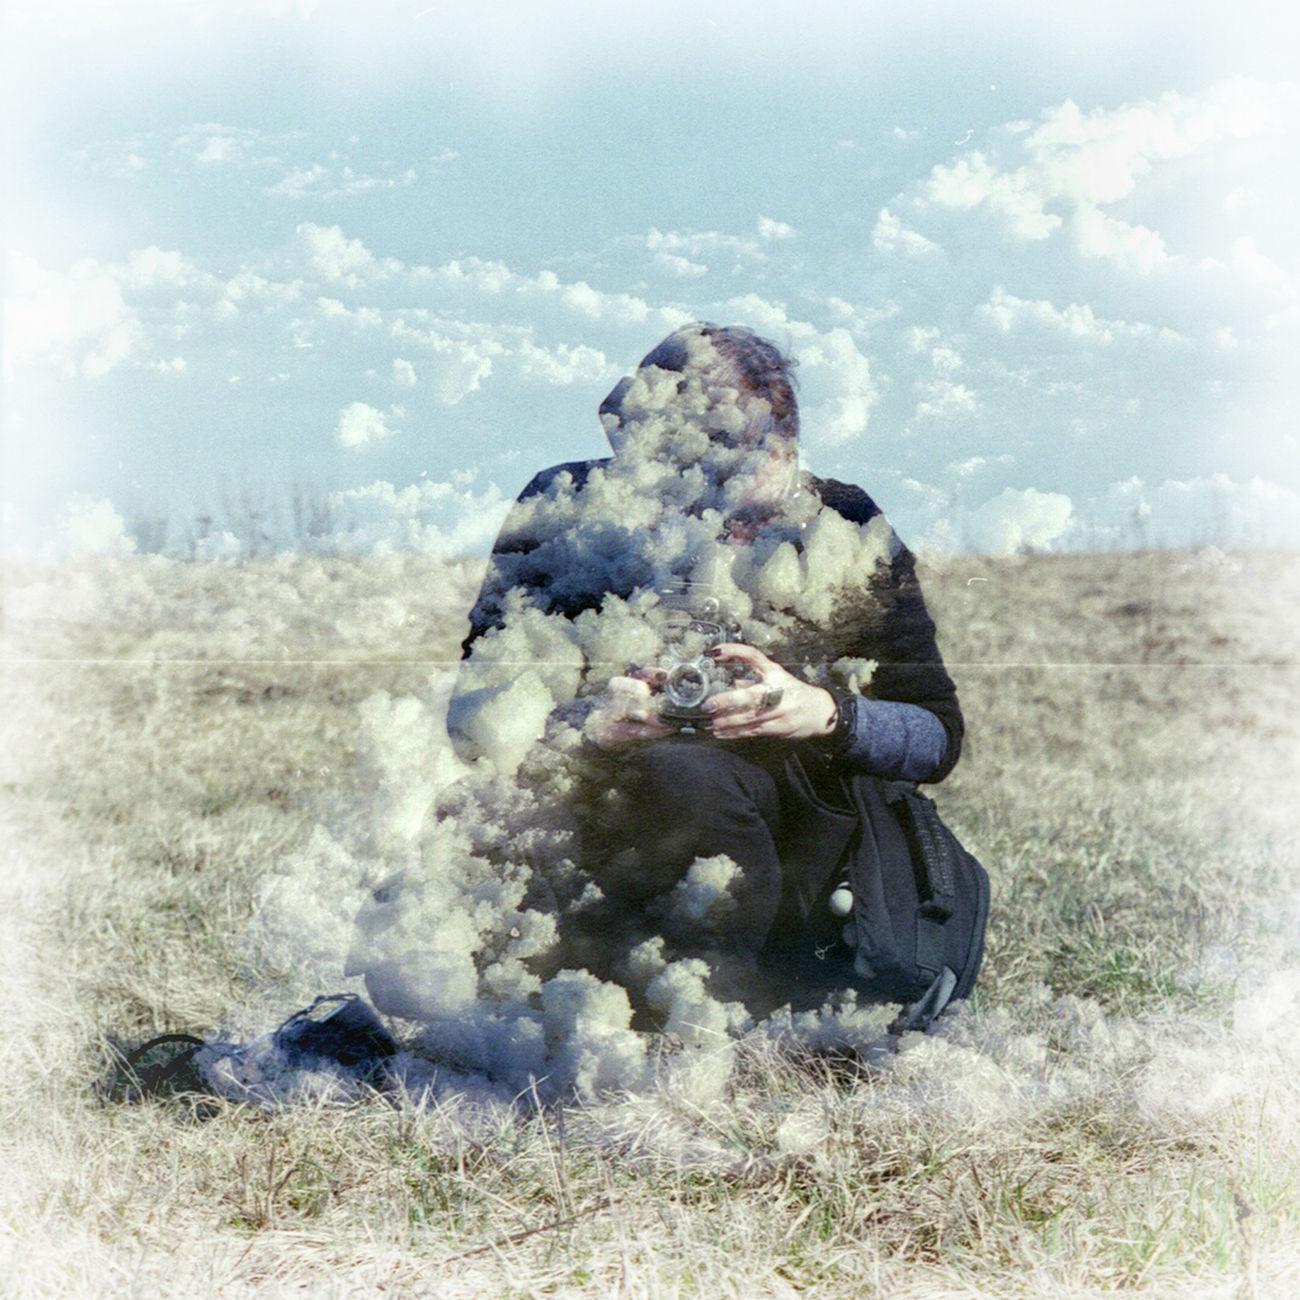 FilmSwap: Cloud Sheperd (film swap with Gintarė Vilcinytė) Film Swap Analogue Photography Double Exposure Photographer Clouds Lithuania Multiexposure  Surreal